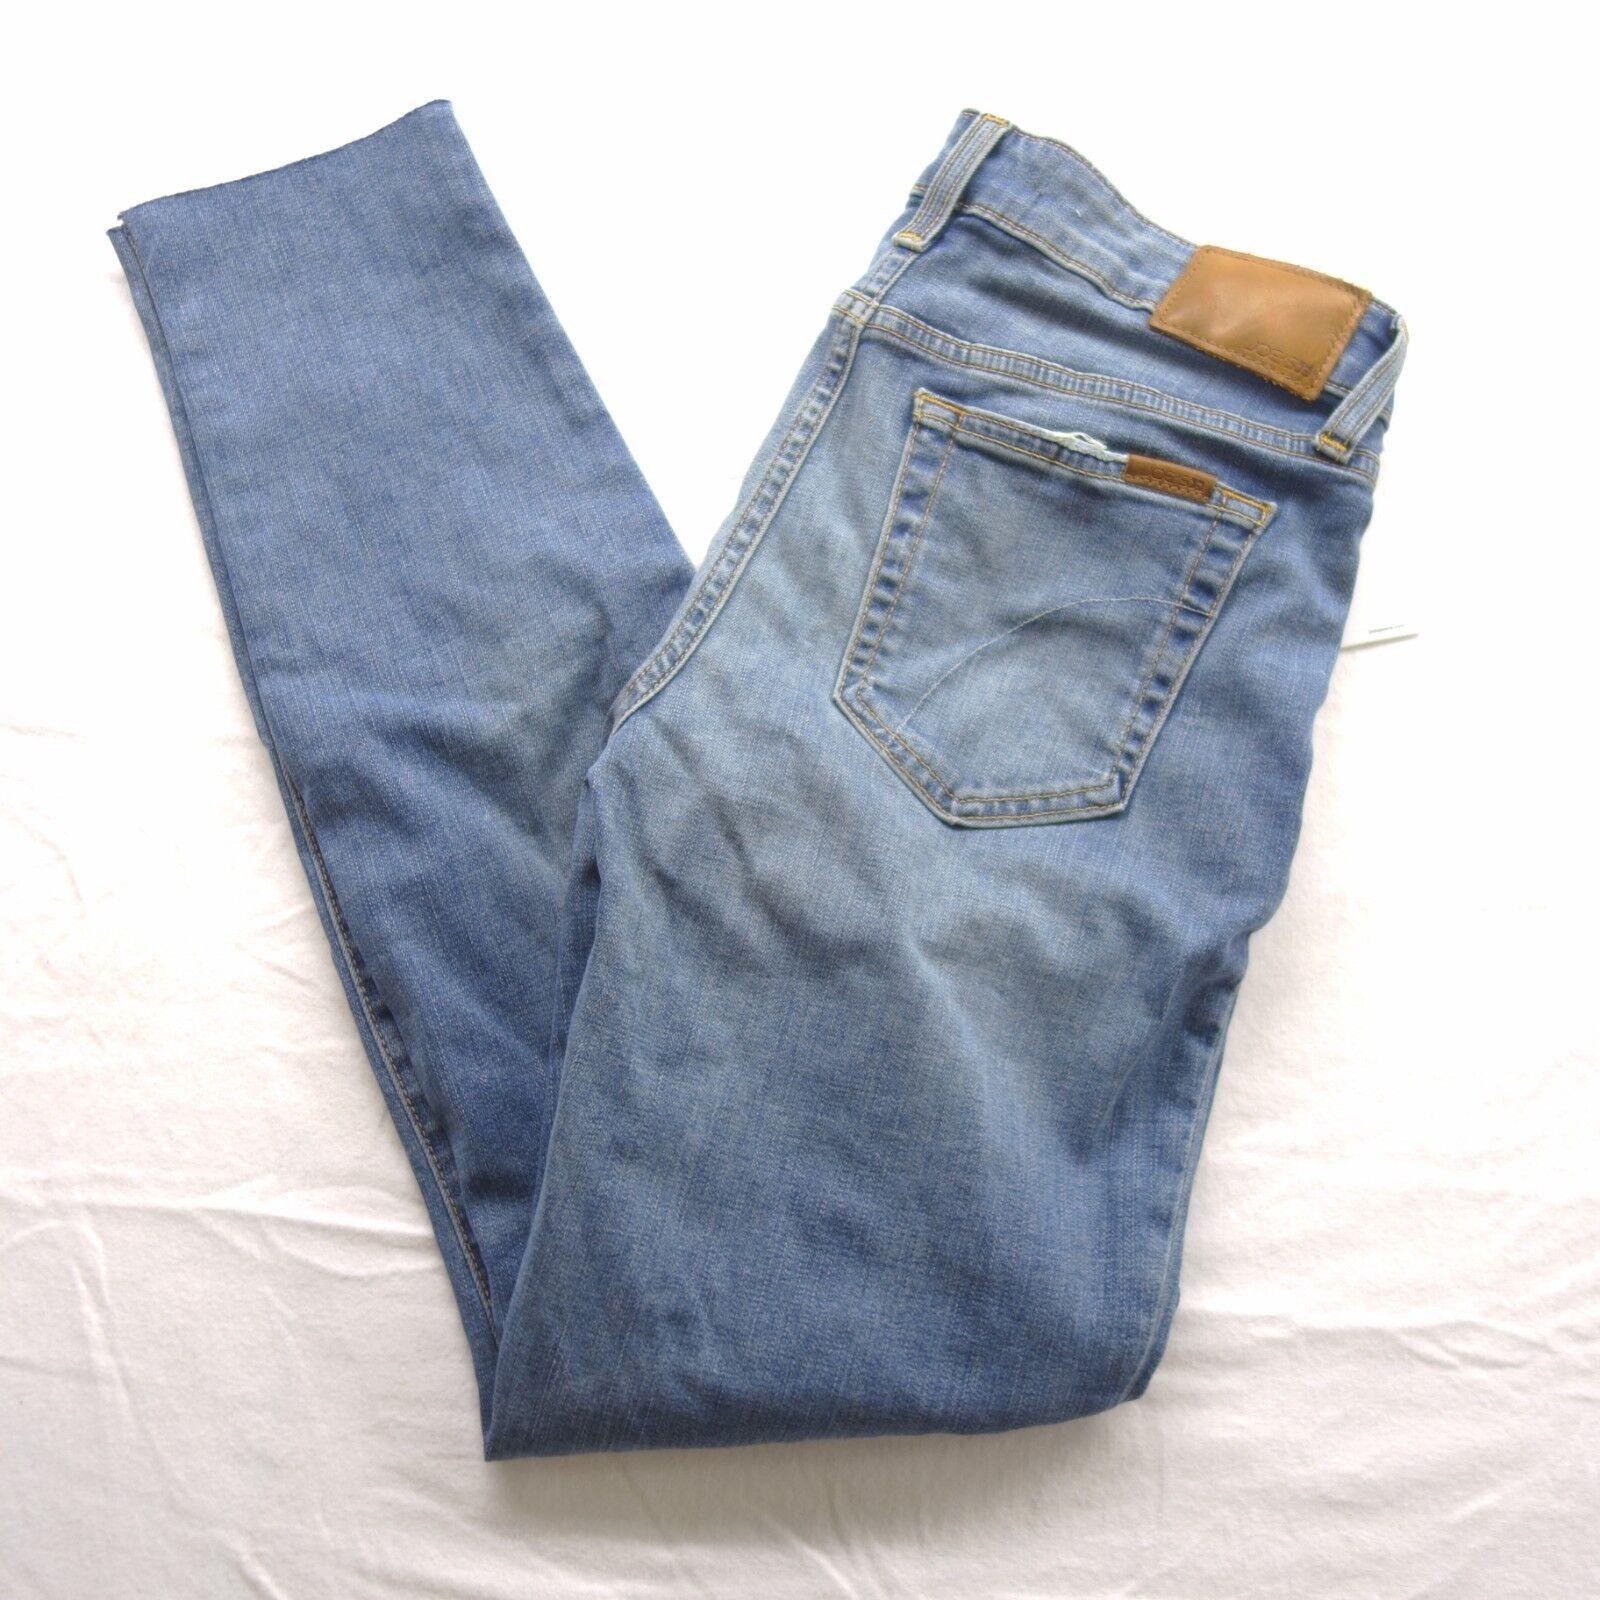 New Joe's Womens Distressed bluee Mid Rise Straight Leg Denim Jeans Pants 29 x 28